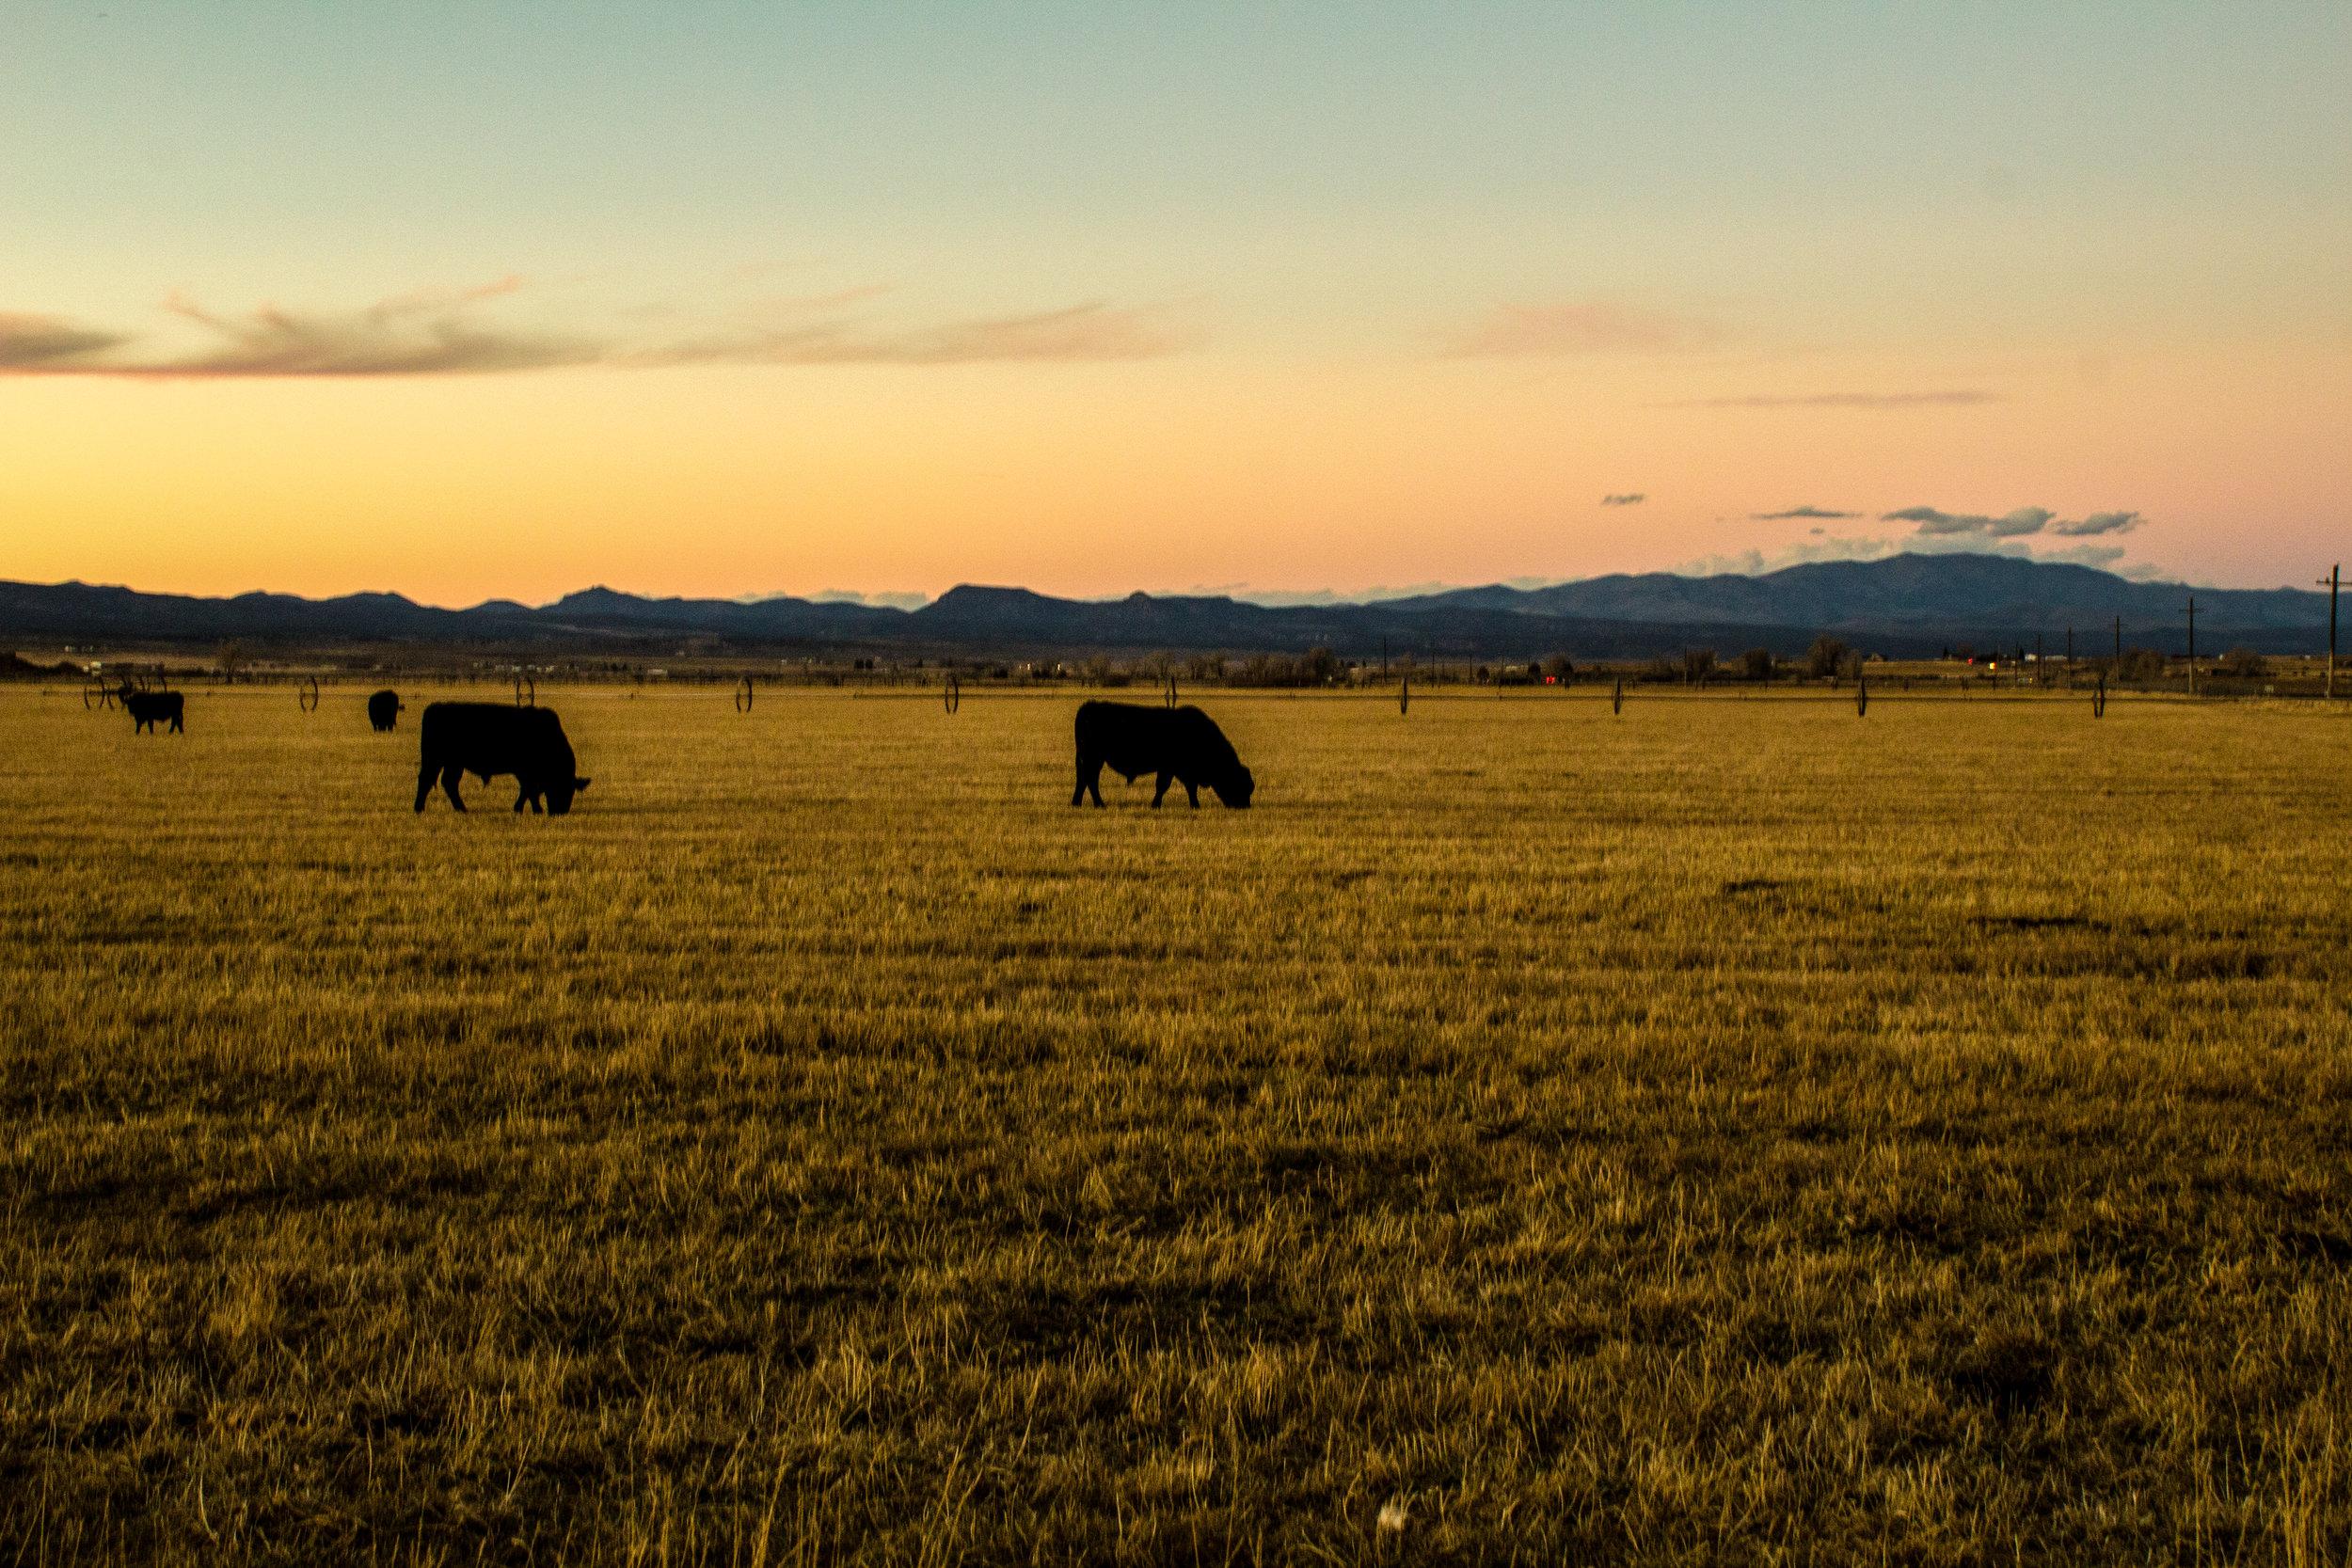 Cattle Ranch - Panguitch, UT